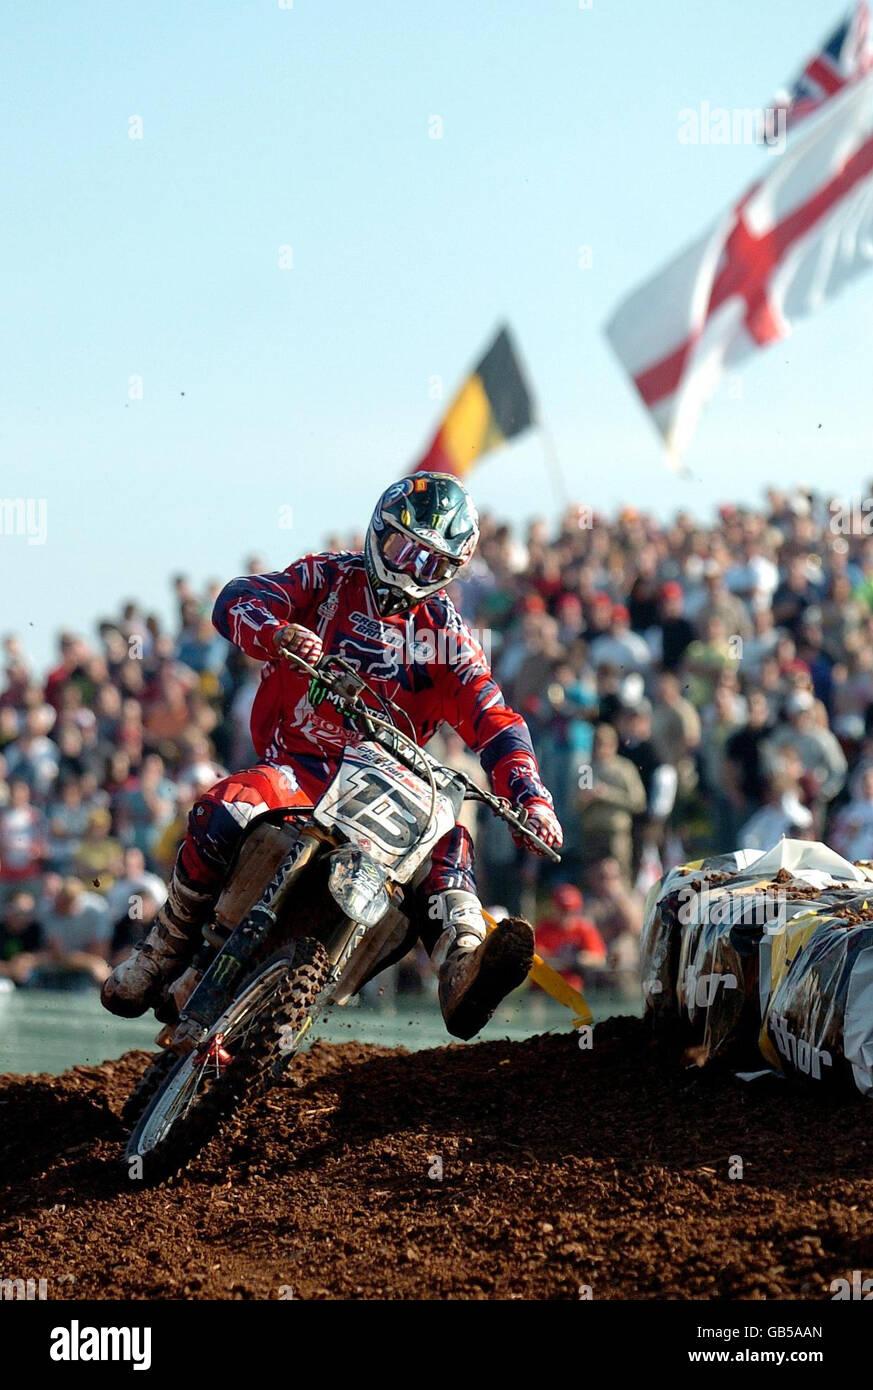 Moto - Red Bull Motocross Of Nations - Donington Park - Stock Image